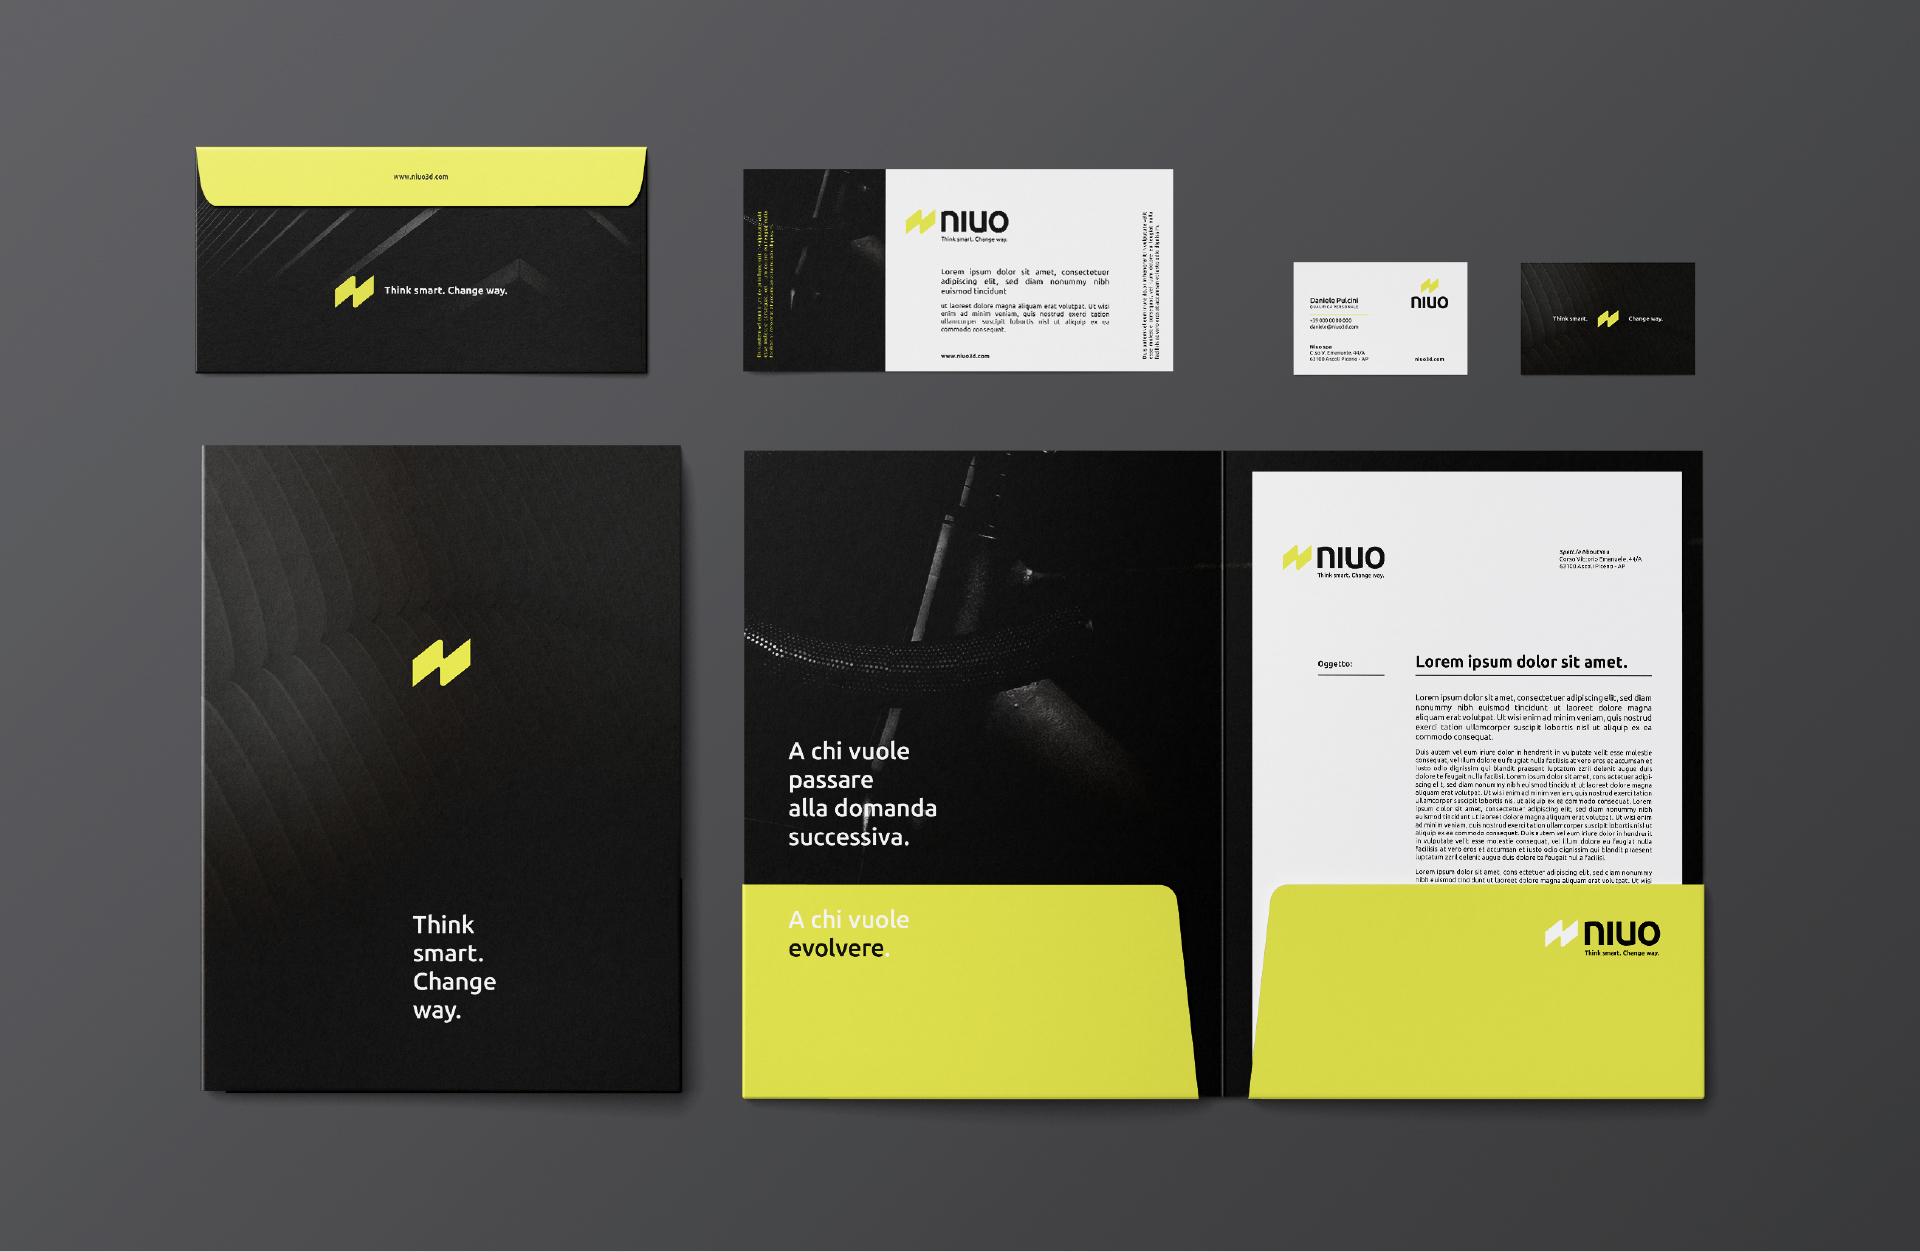 Niuo Brand Identity